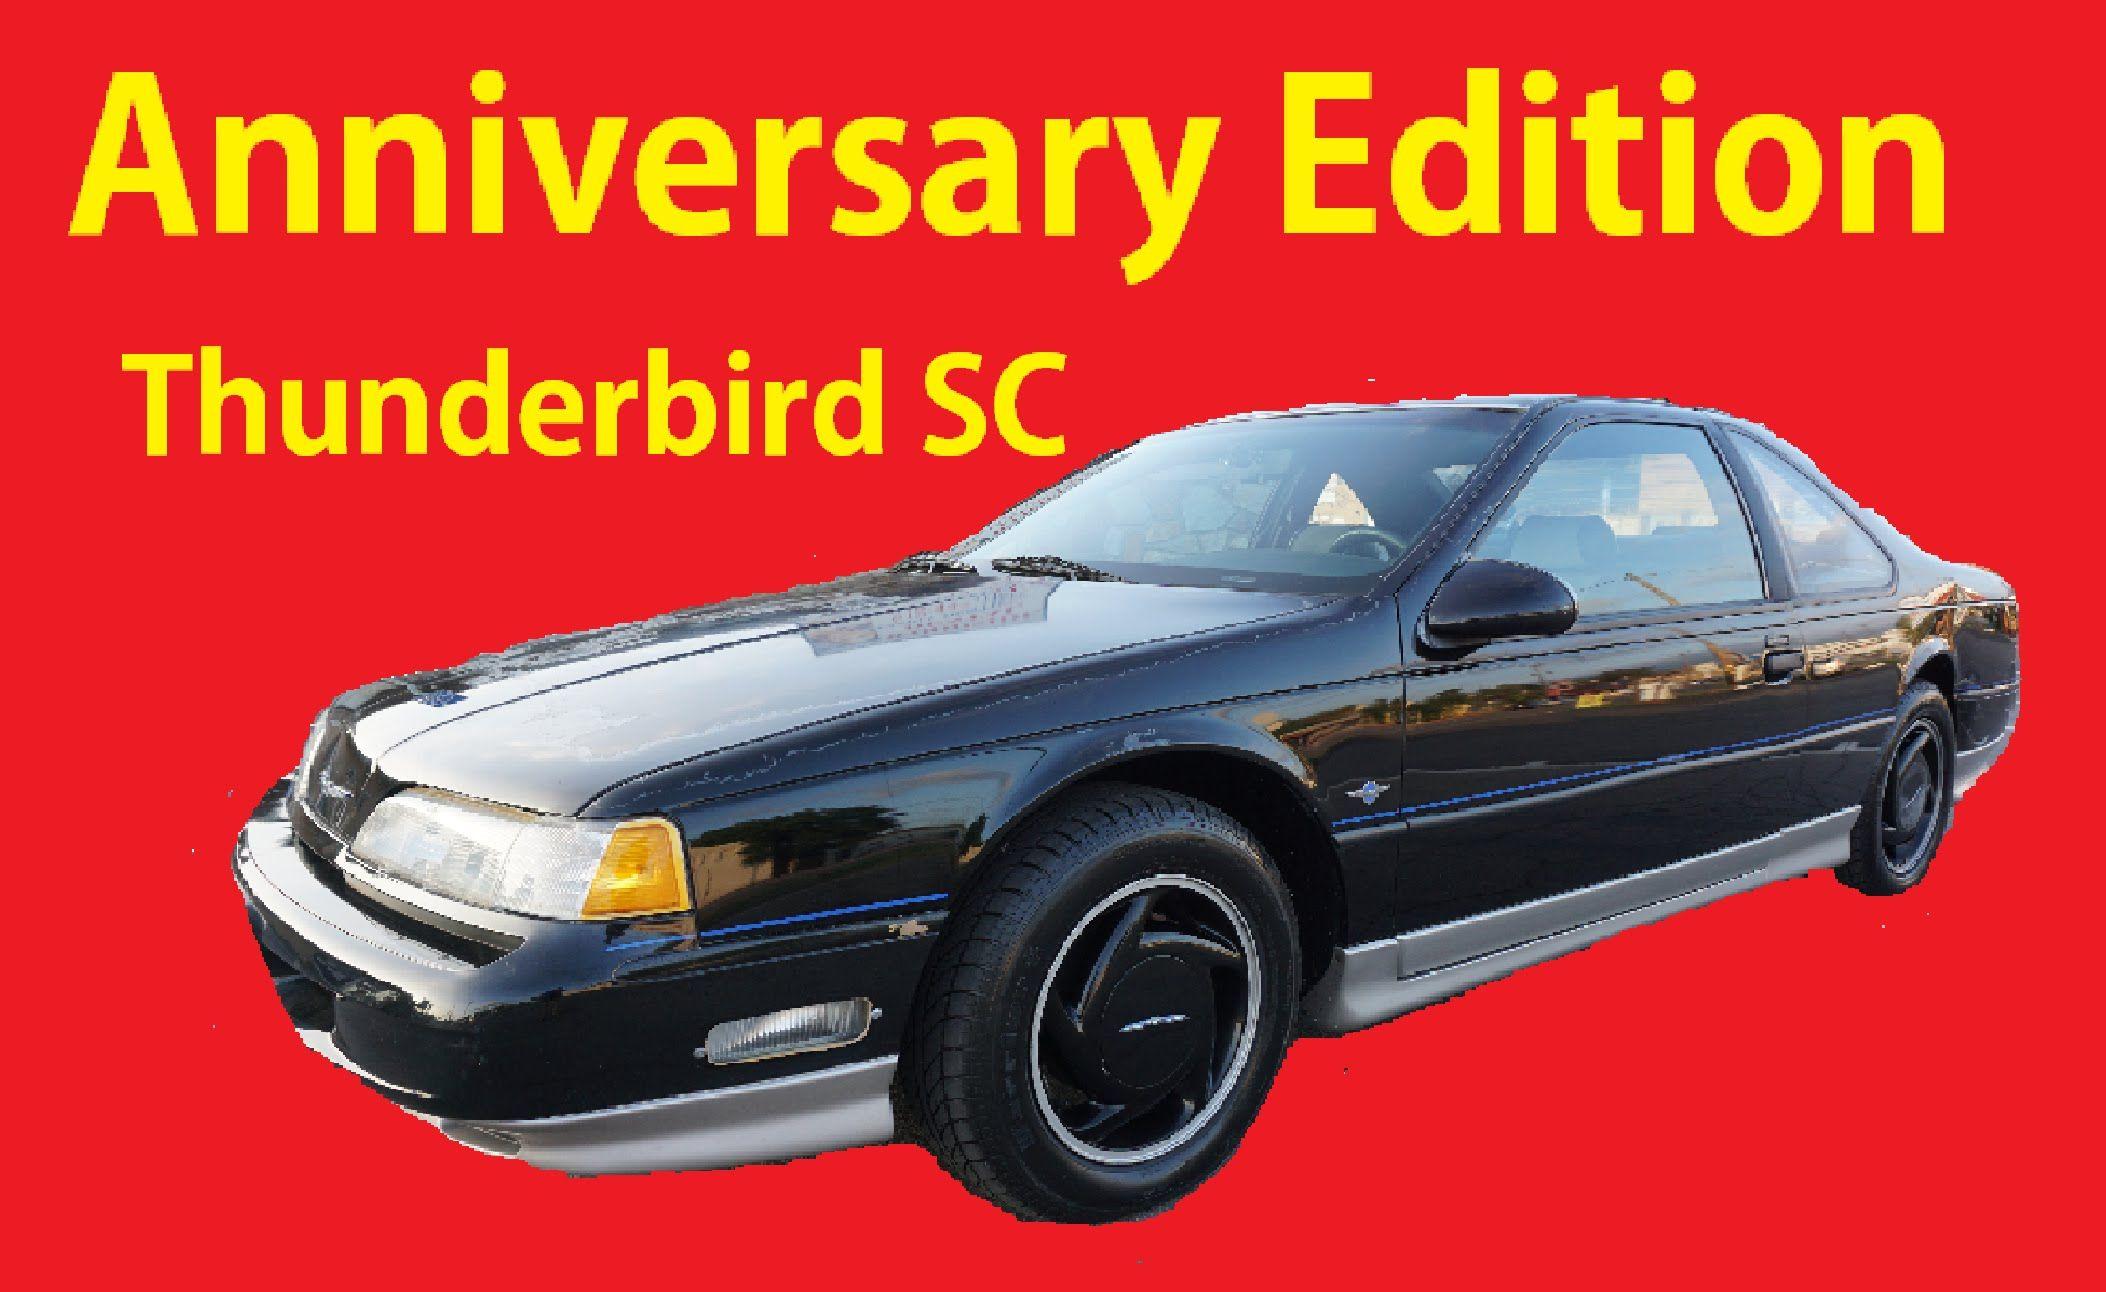 Anniversary Edition Ford Thunderbird SC Supercharged T-Bird Manual Coupe Ford  Thunderbird, Manual,